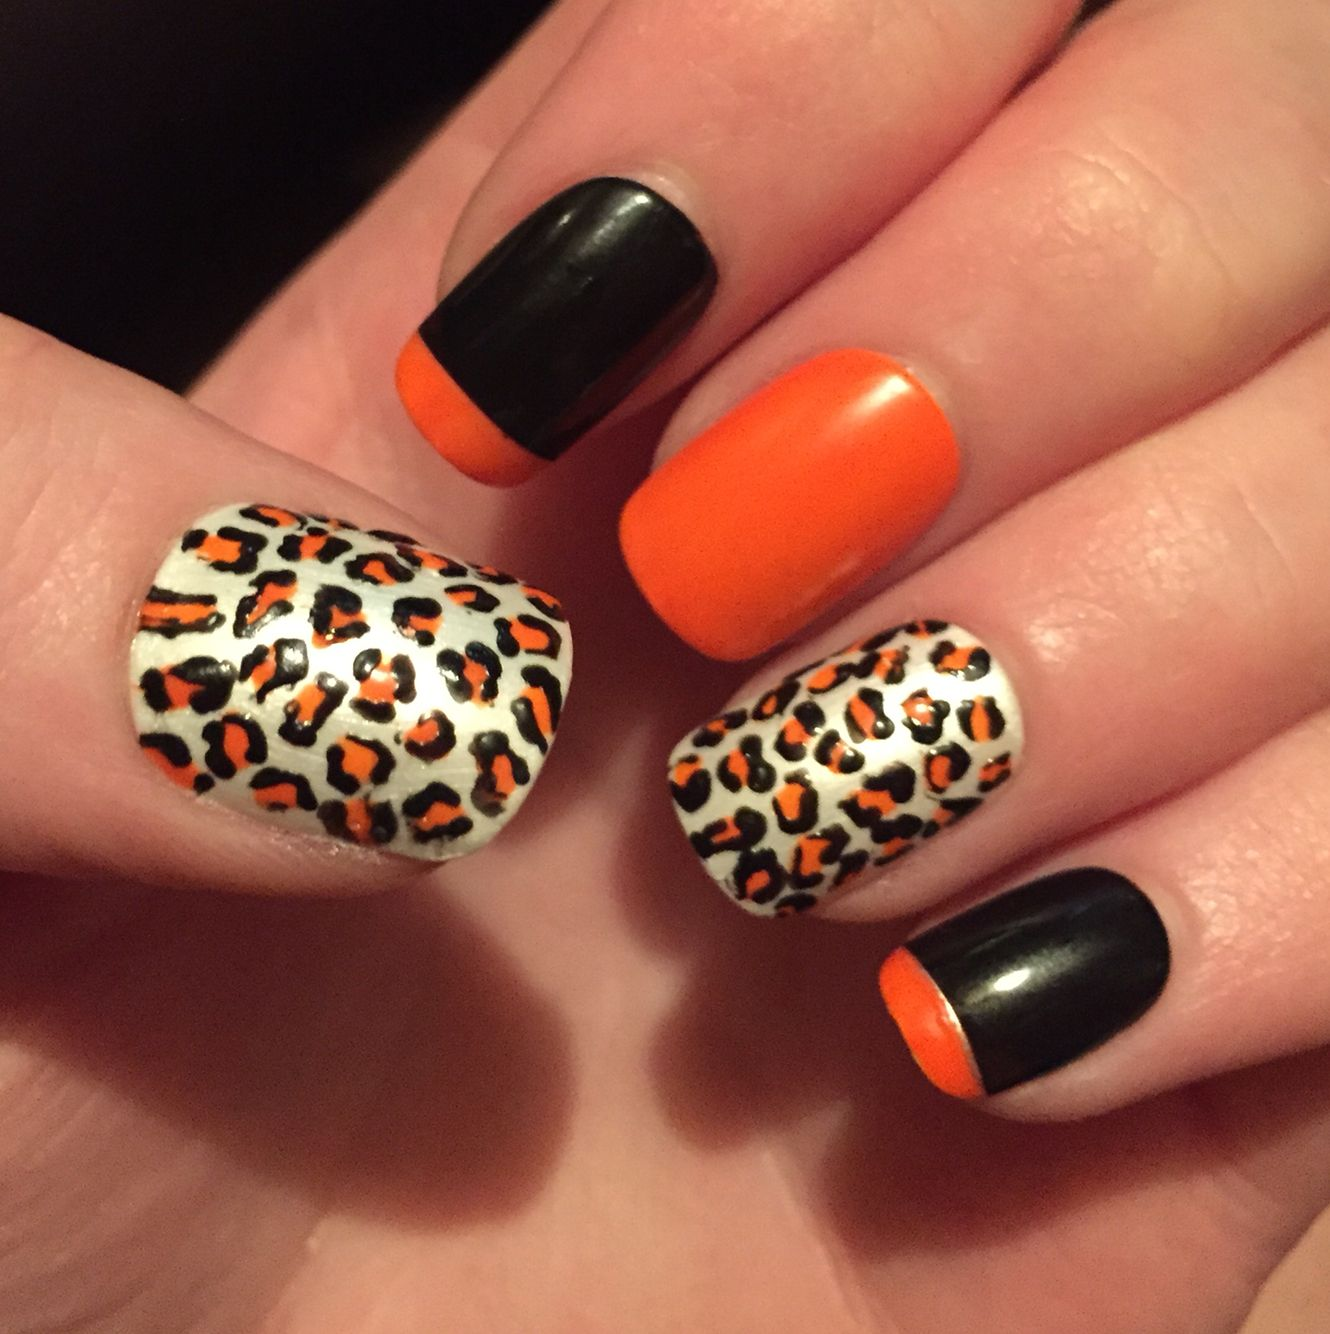 Neon orange leopard nail art | Nail designs | Pinterest | Leopard ...